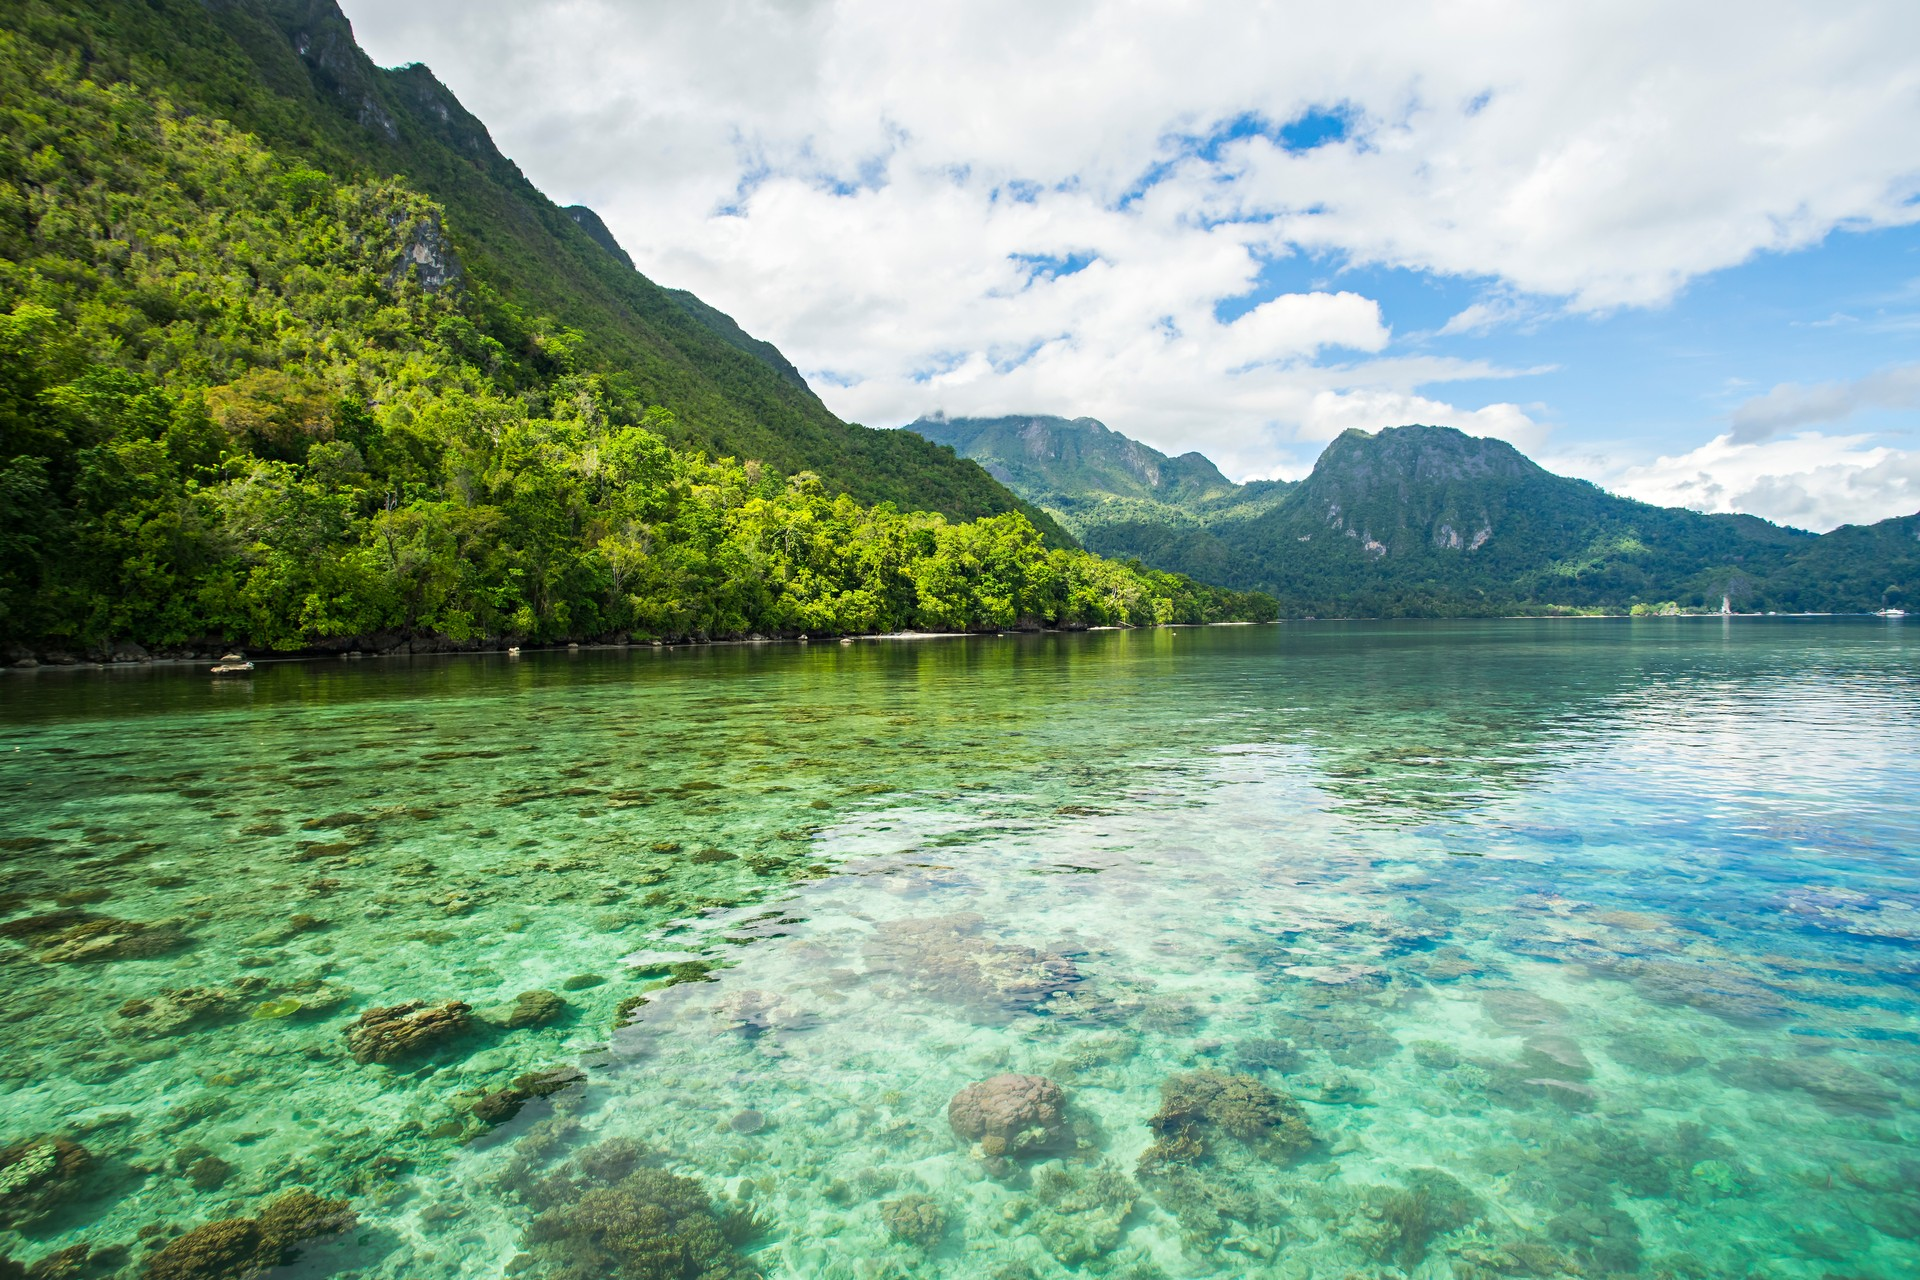 View of Seram island in Indonesia